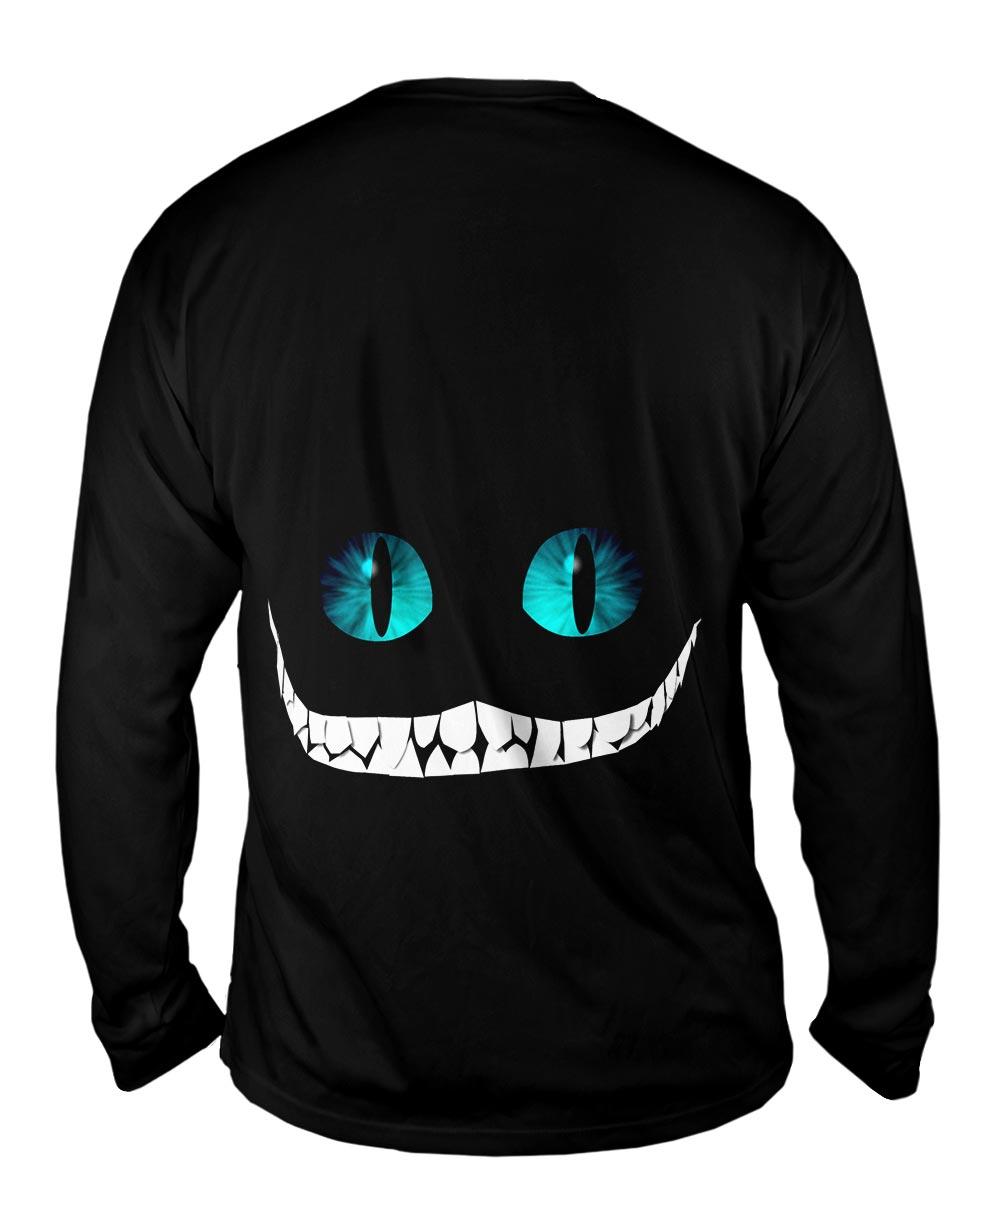 Yizzam Cheshire Cat New Mens Long Sleeve Tee Shirt Xs S